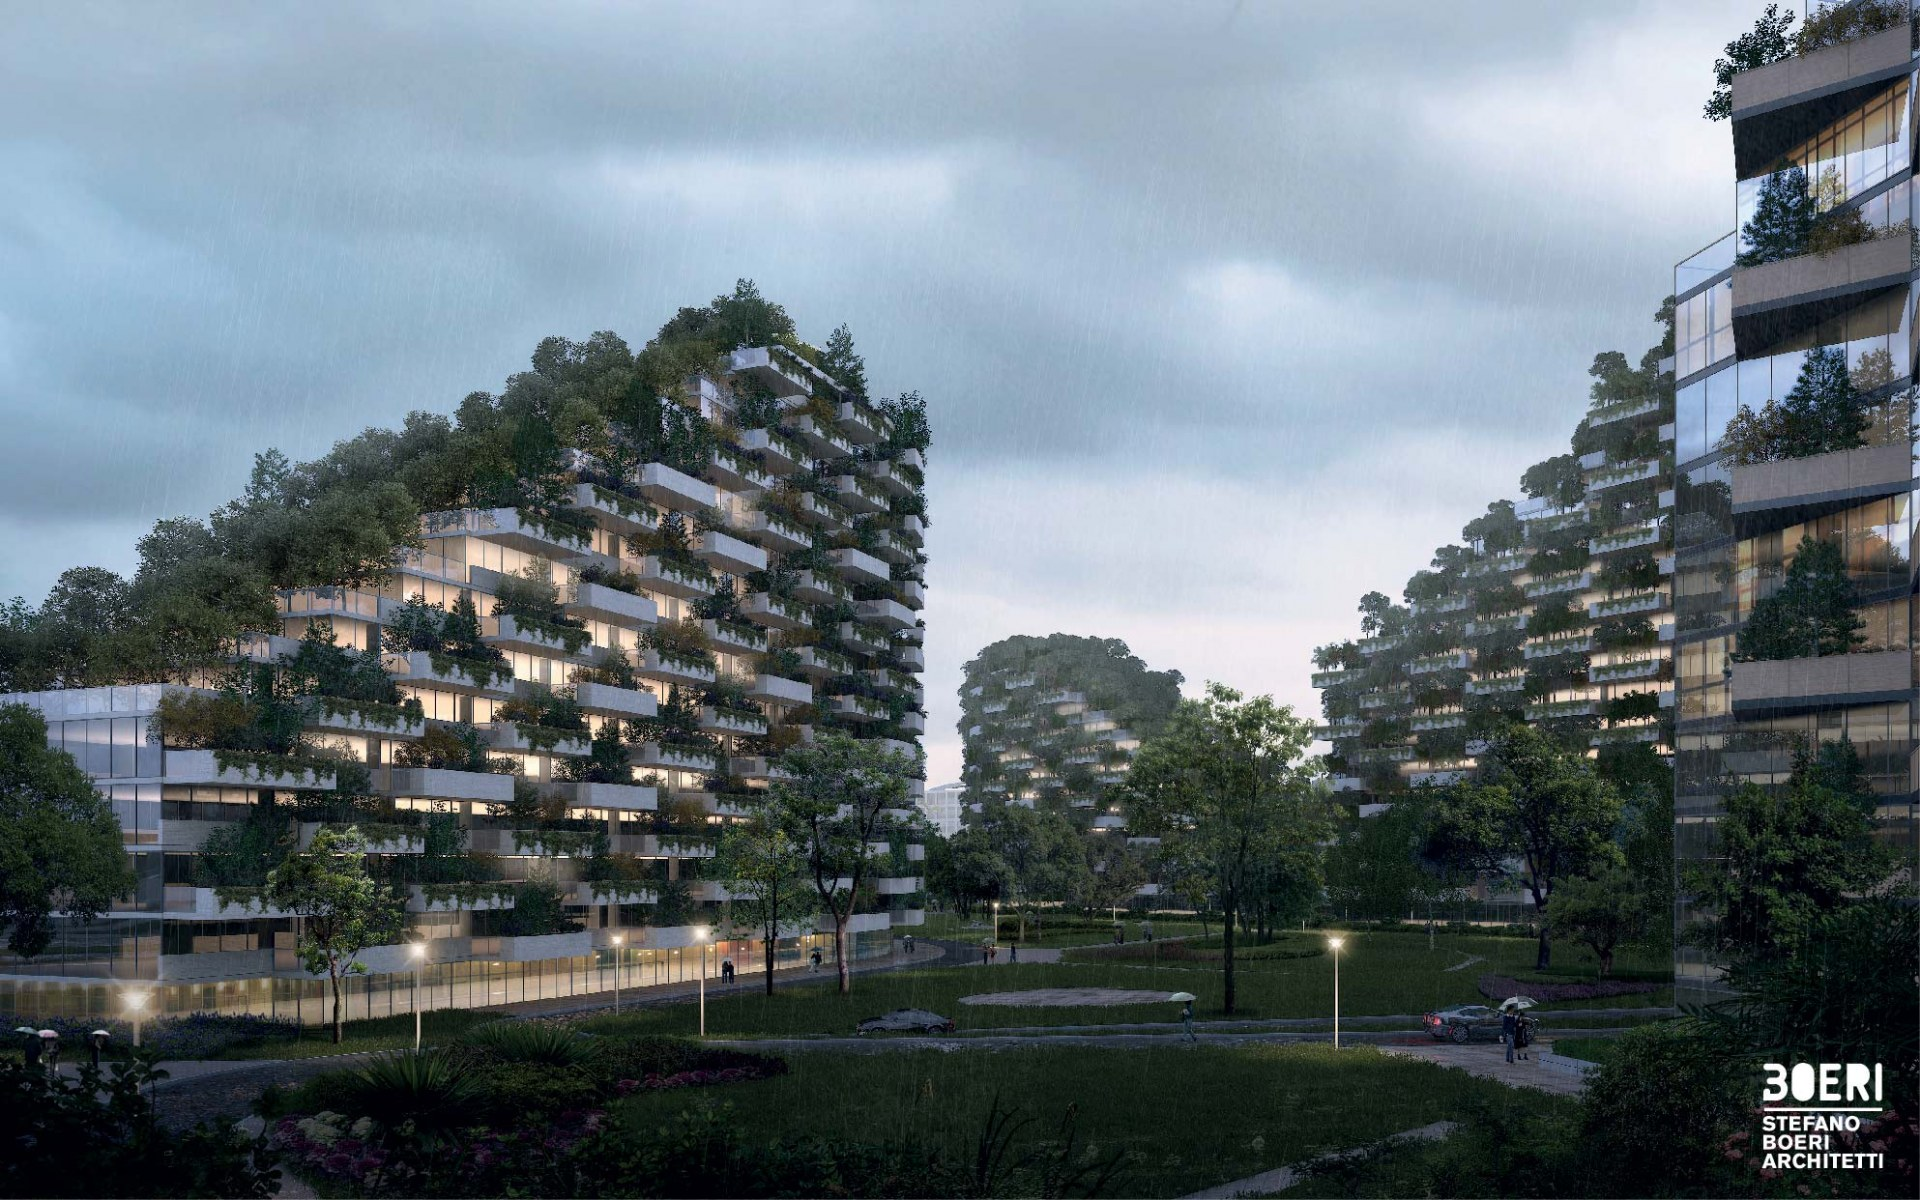 Stefano-Boeri-Architetti_Liuzhou-Forest-city_human-view